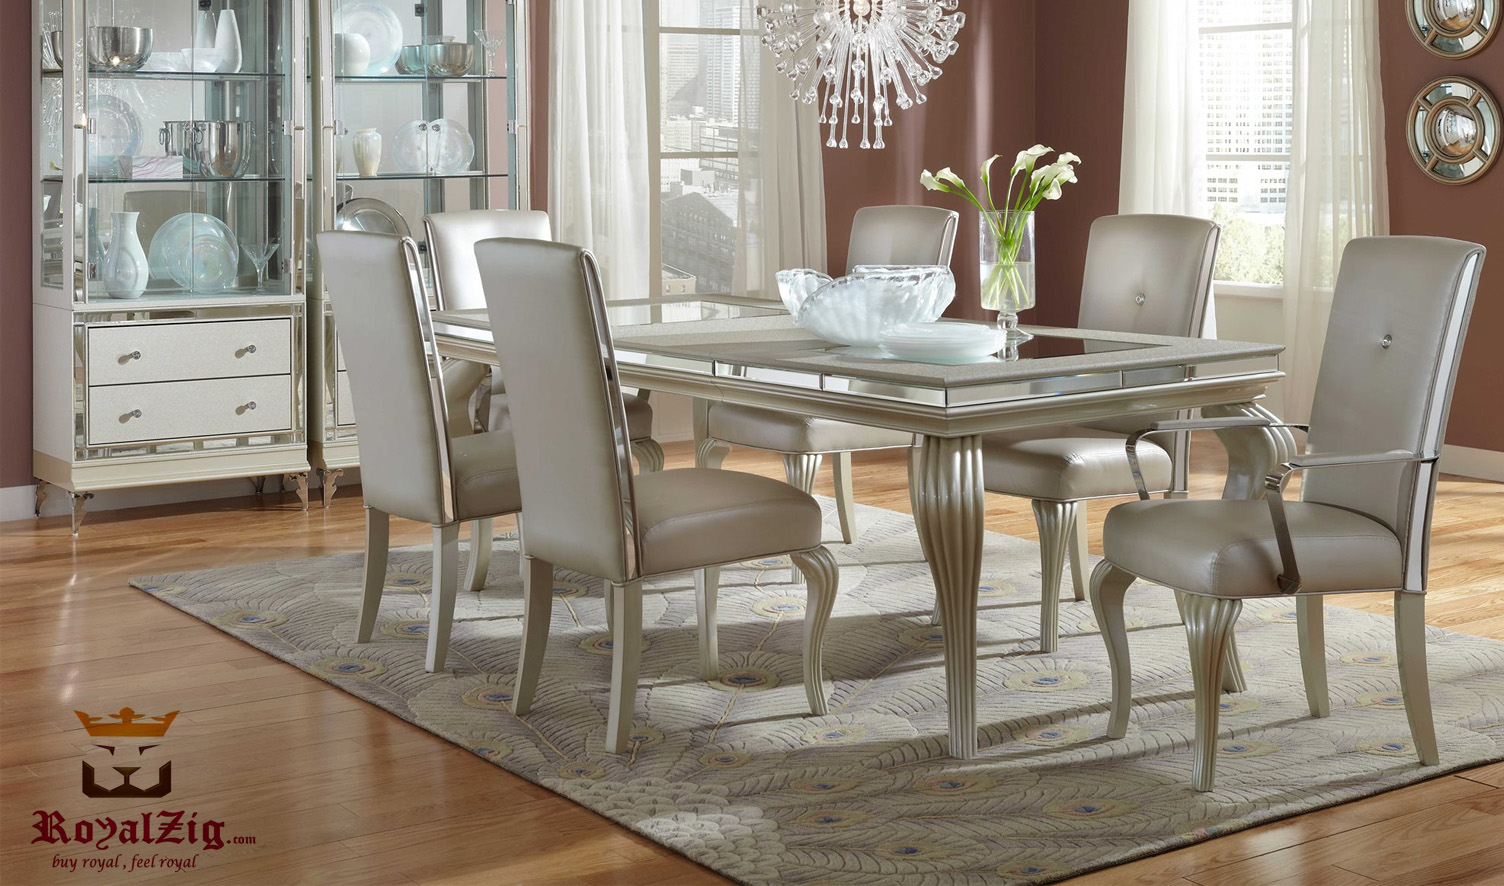 Median Modern Luxury Italian Style Dining Table